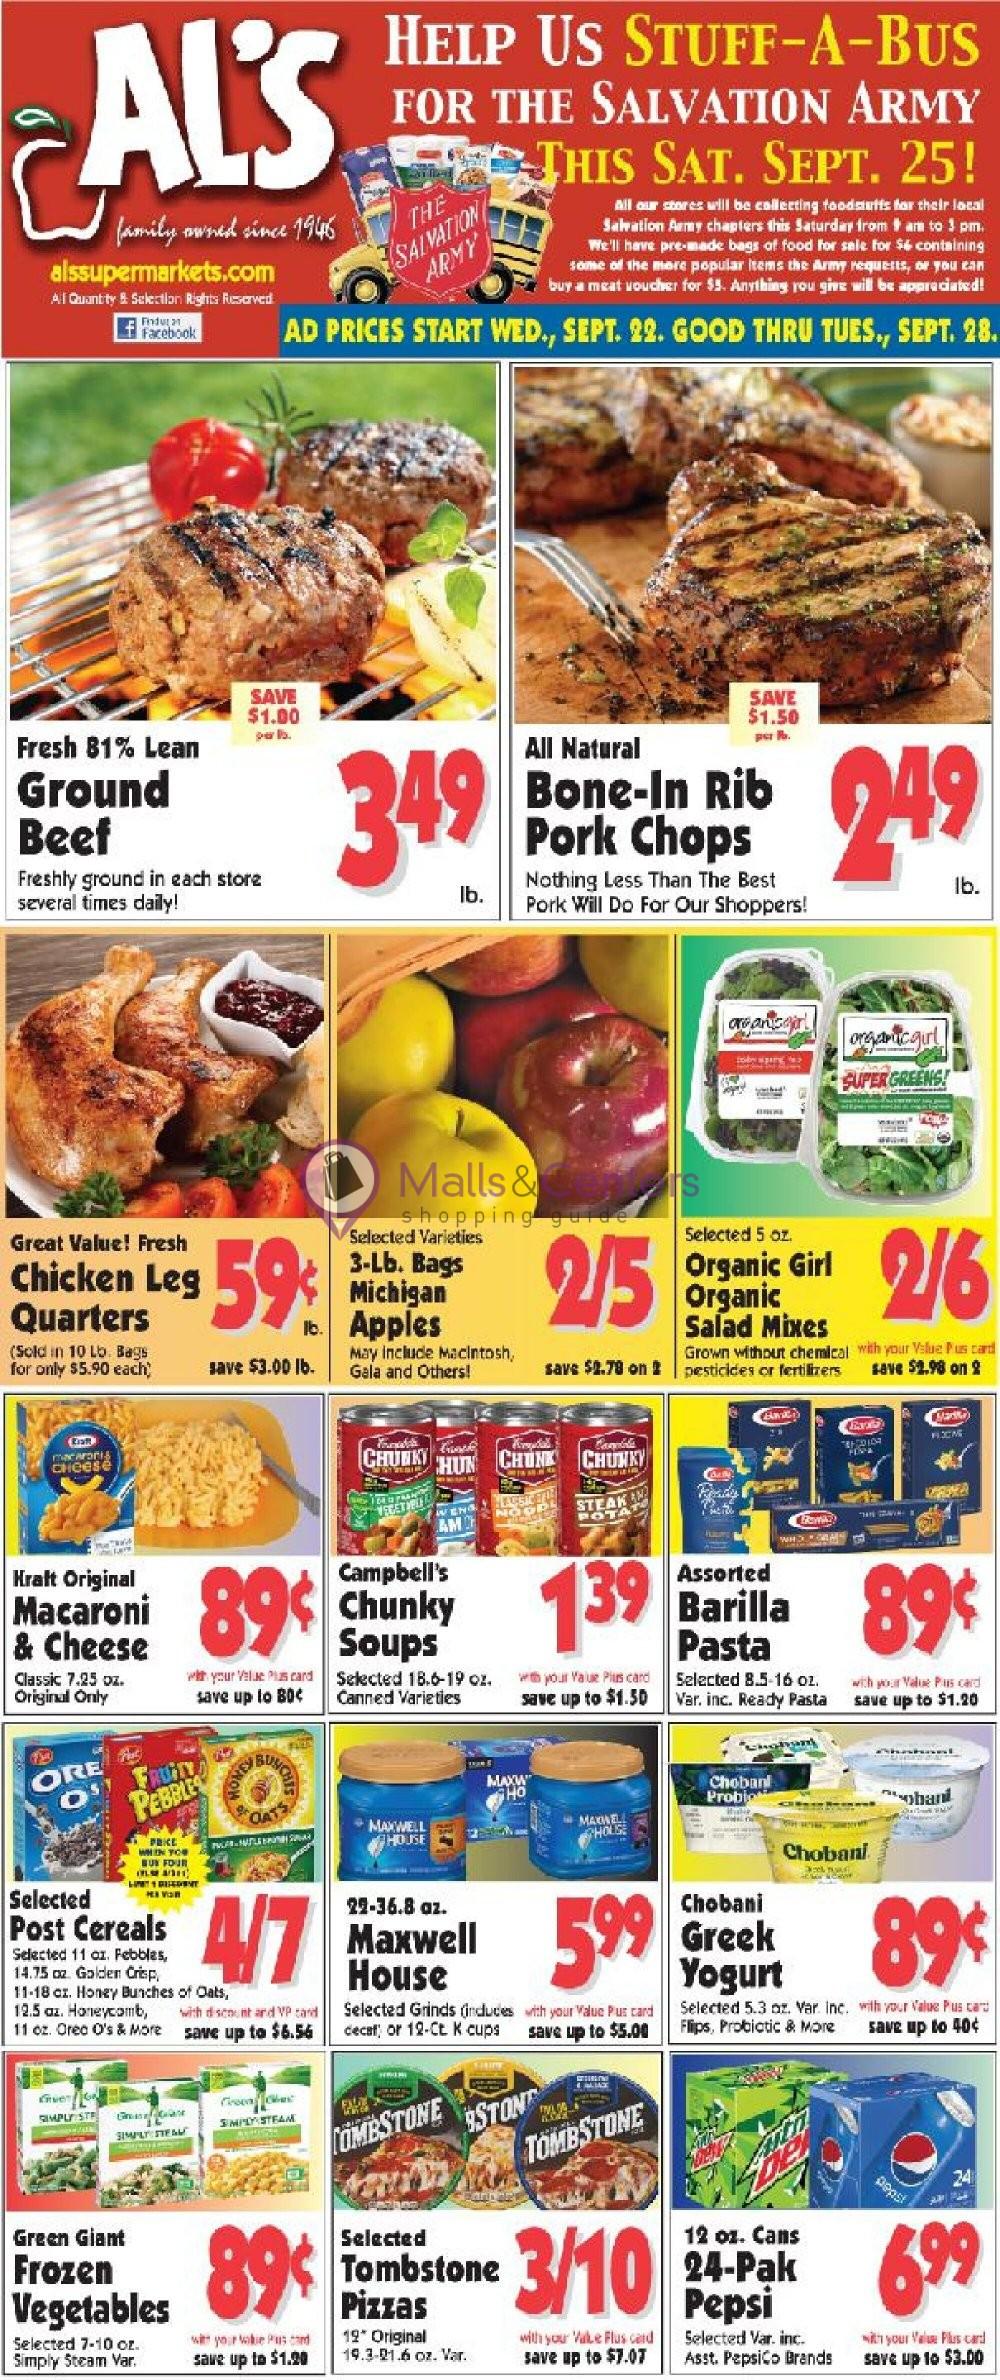 weekly ads Al's Supermarket - page 1 - mallscenters.com